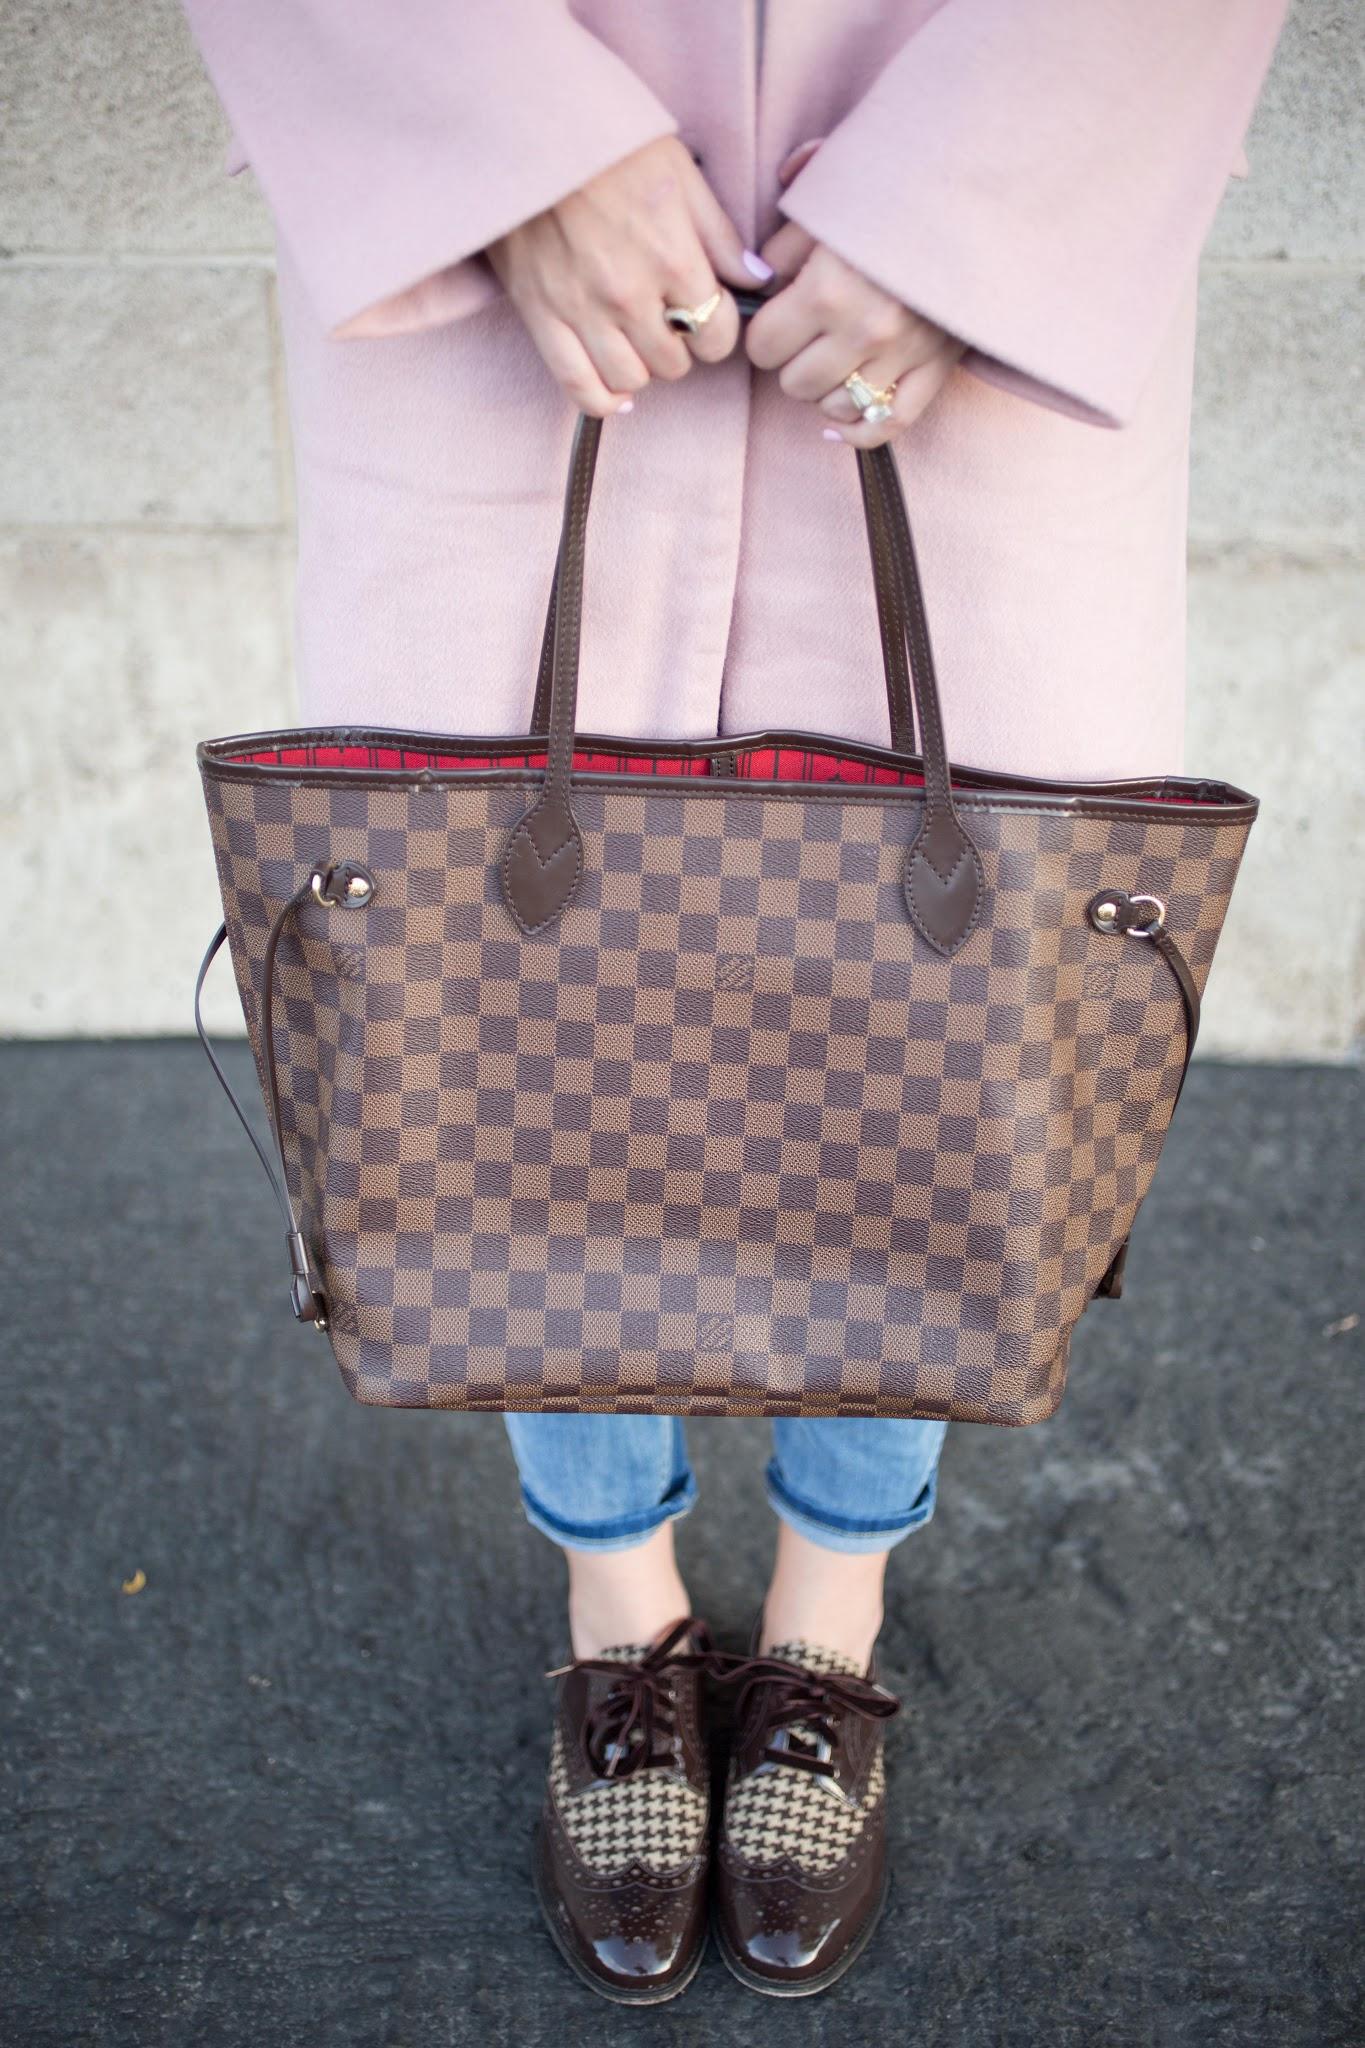 Louis Vuitton Damier Ebene Canvas Bag